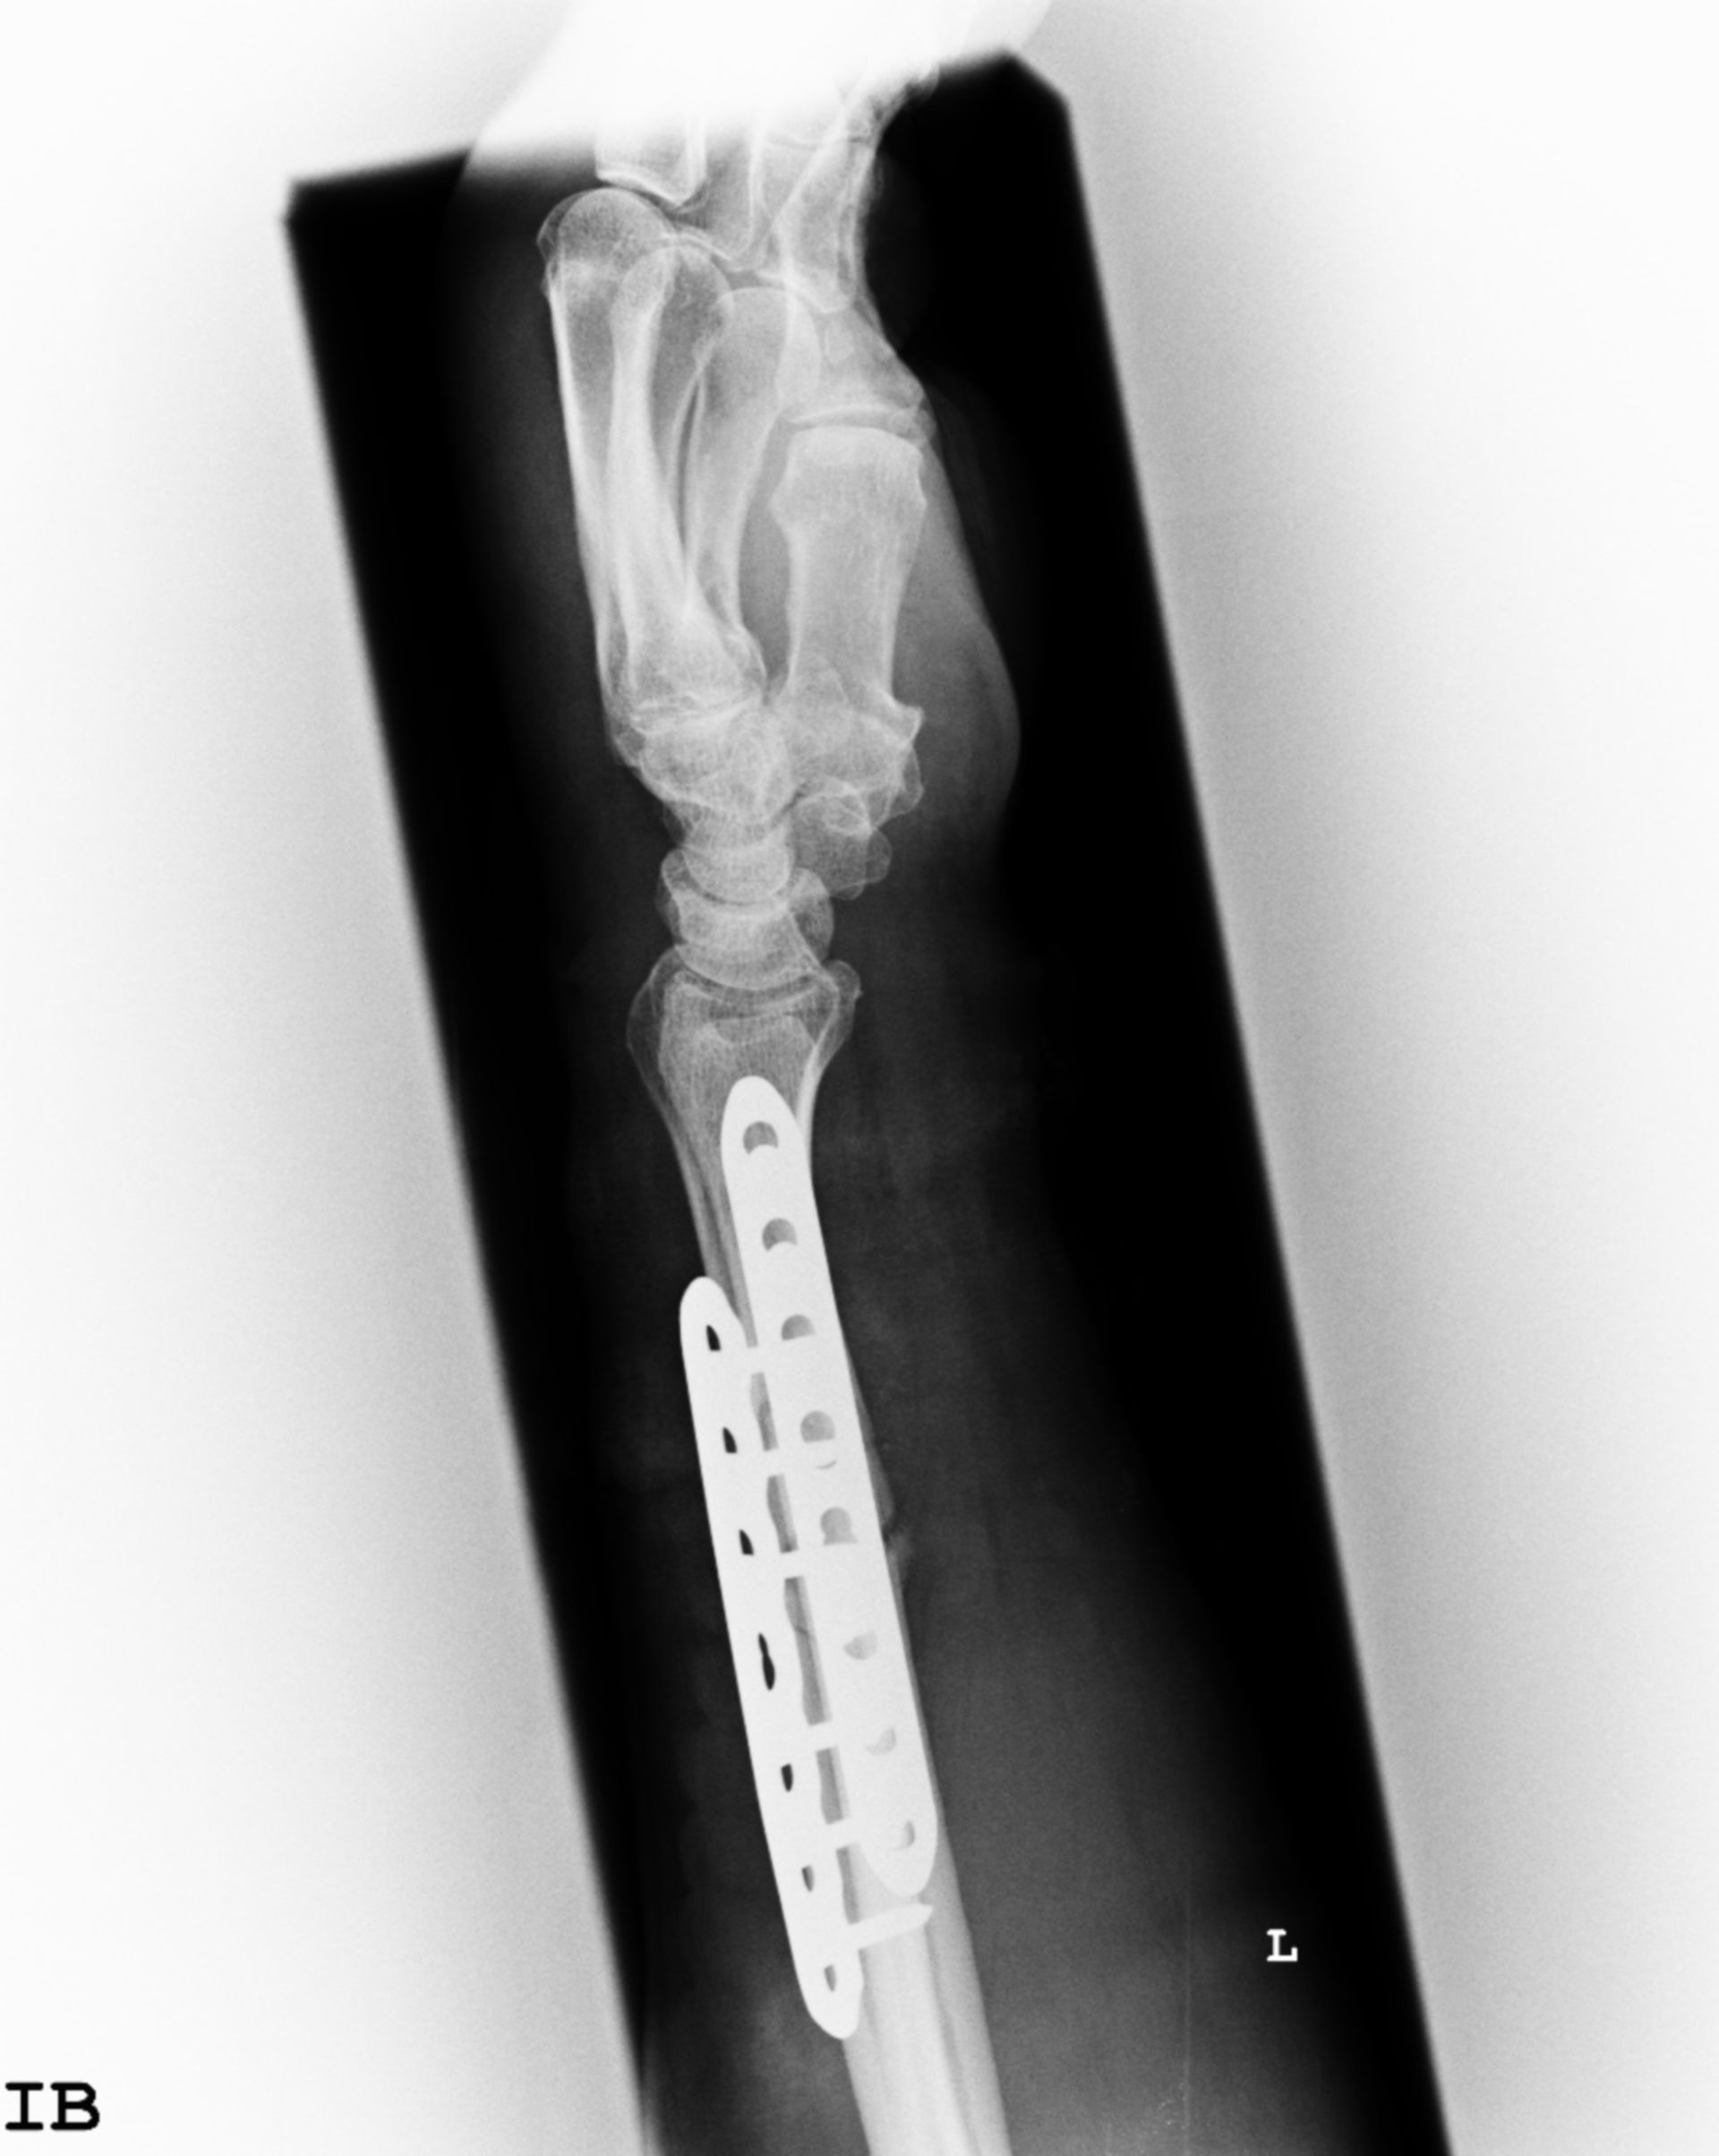 Osteosíntesis con placa